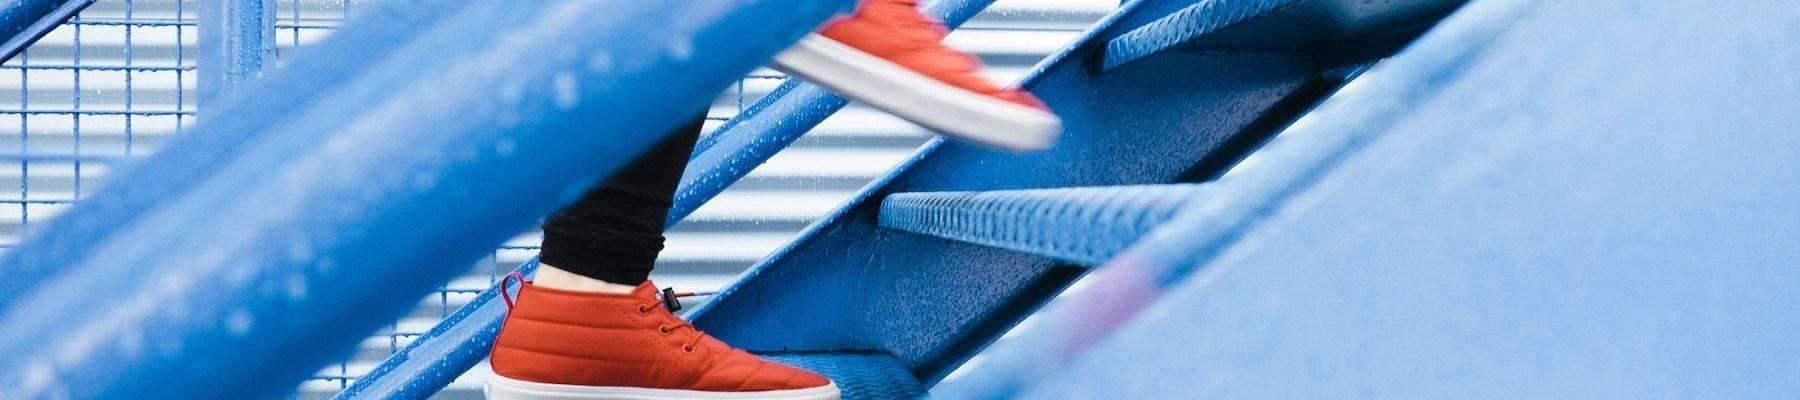 Source: https://pixabay.com/photos/steps-staircase-climbing-1081909/